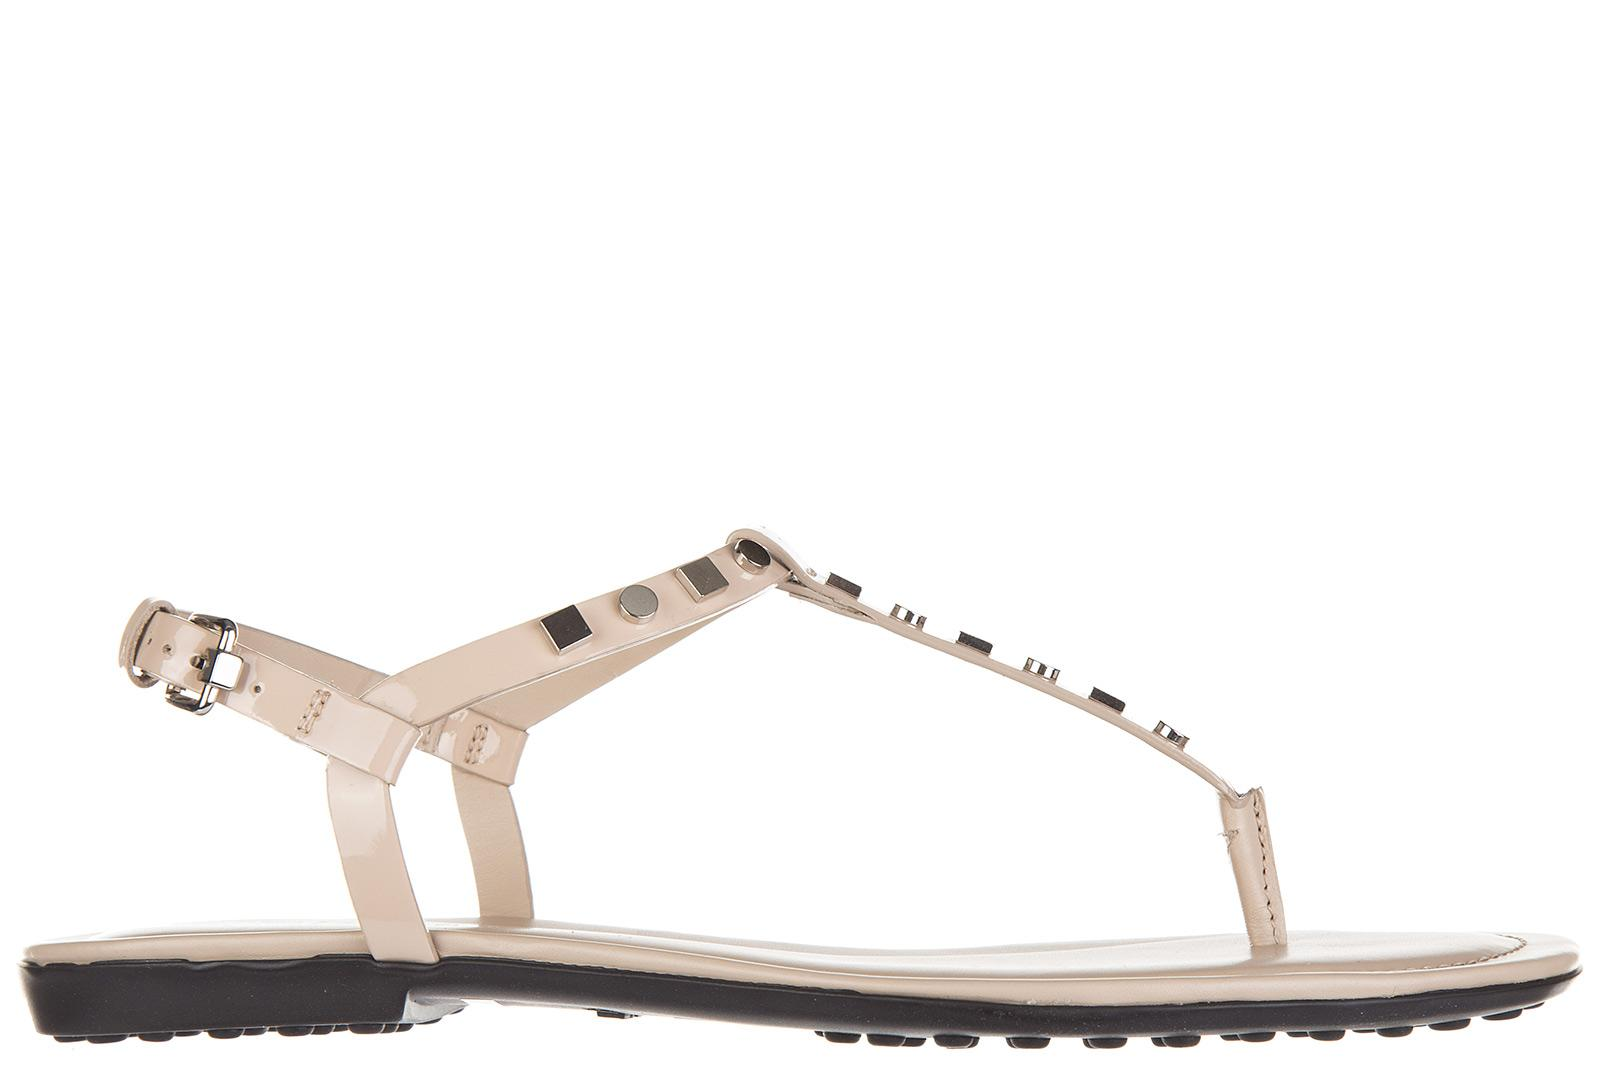 buy online 3a614 ac81e Damen Leder Flip Flops Zehentrenner Sandalen in Beige